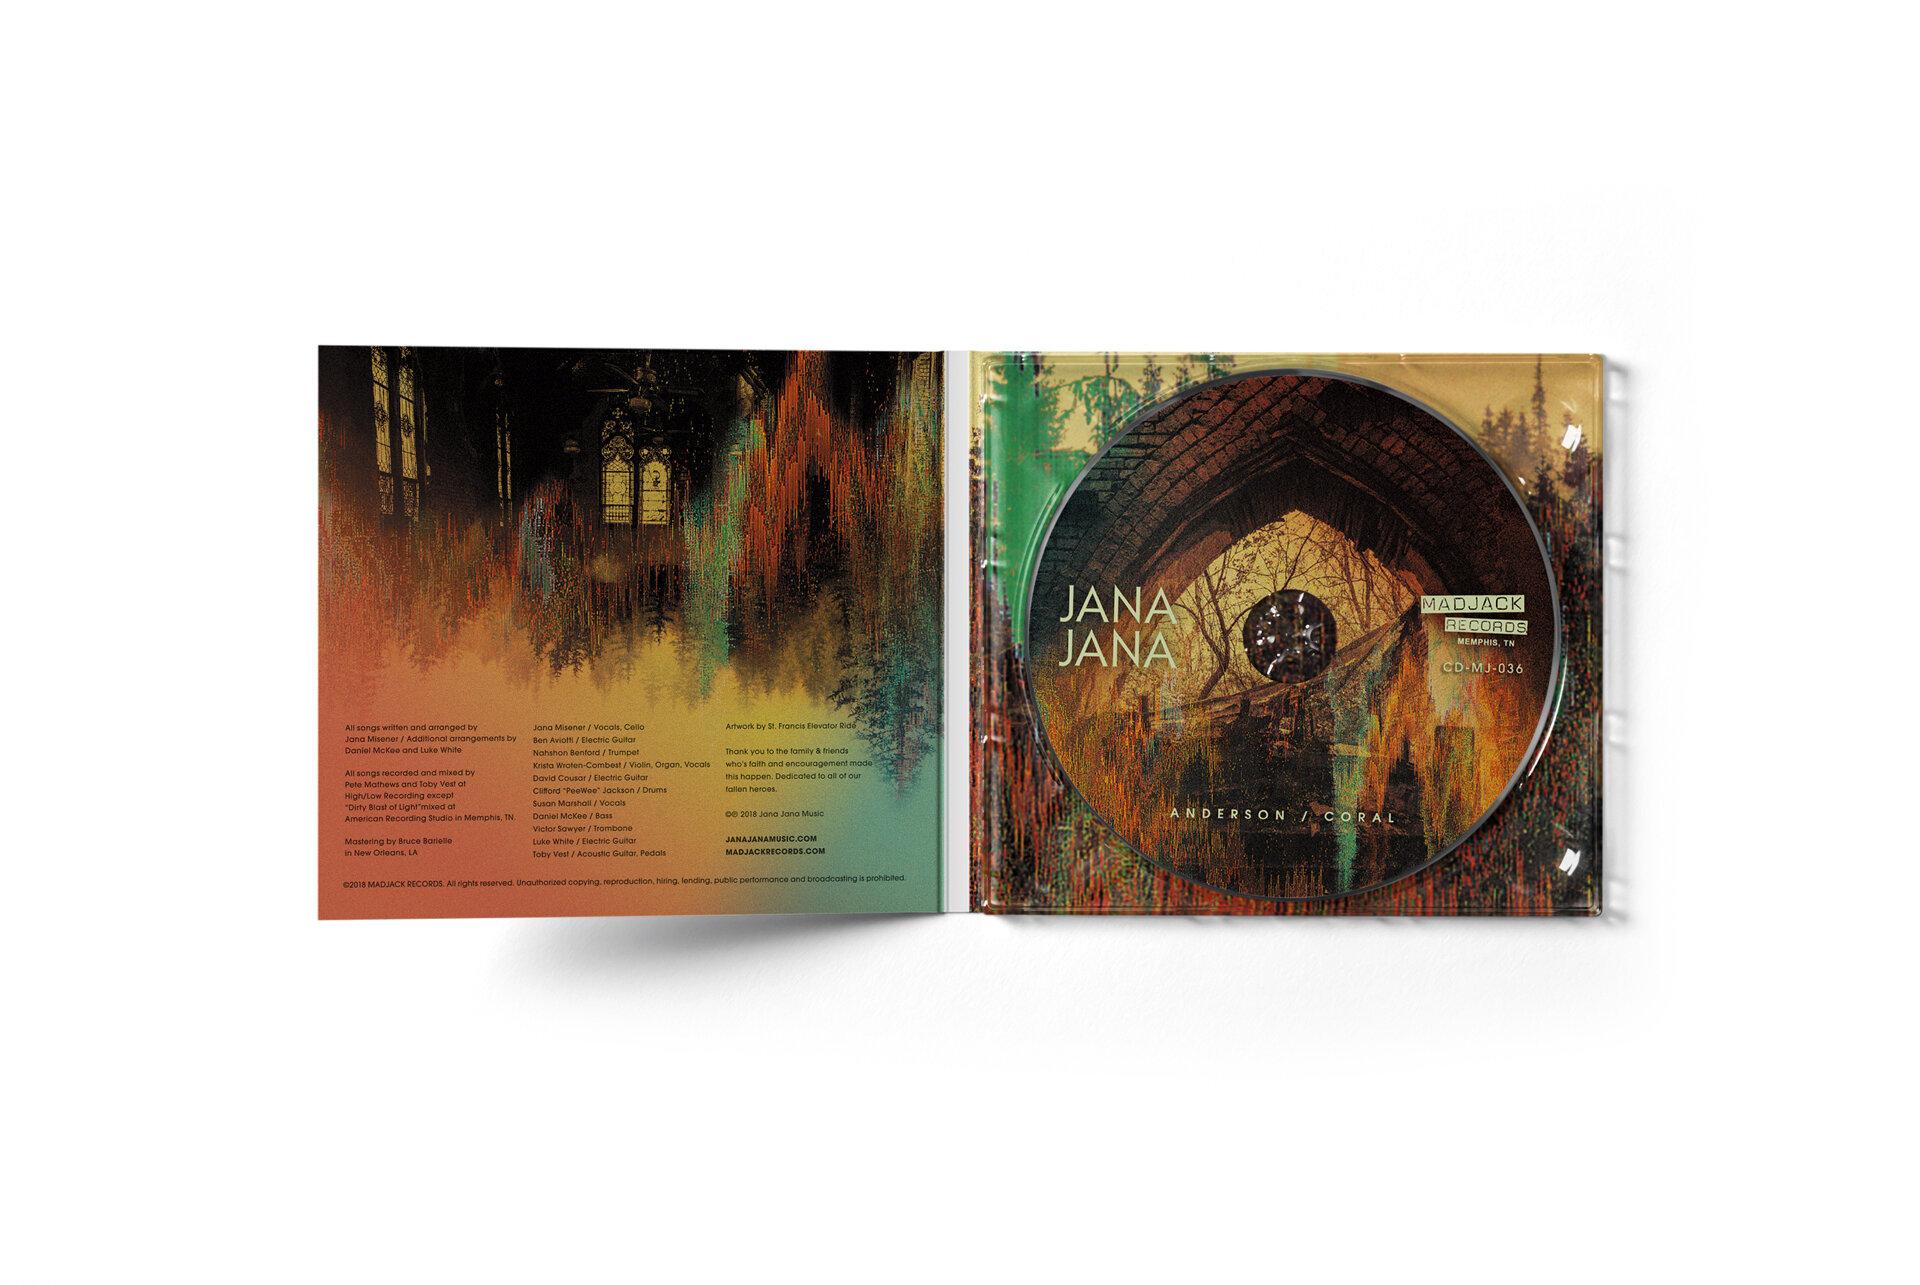 JANA-EP-Digipak-Mockup-Interior.jpg